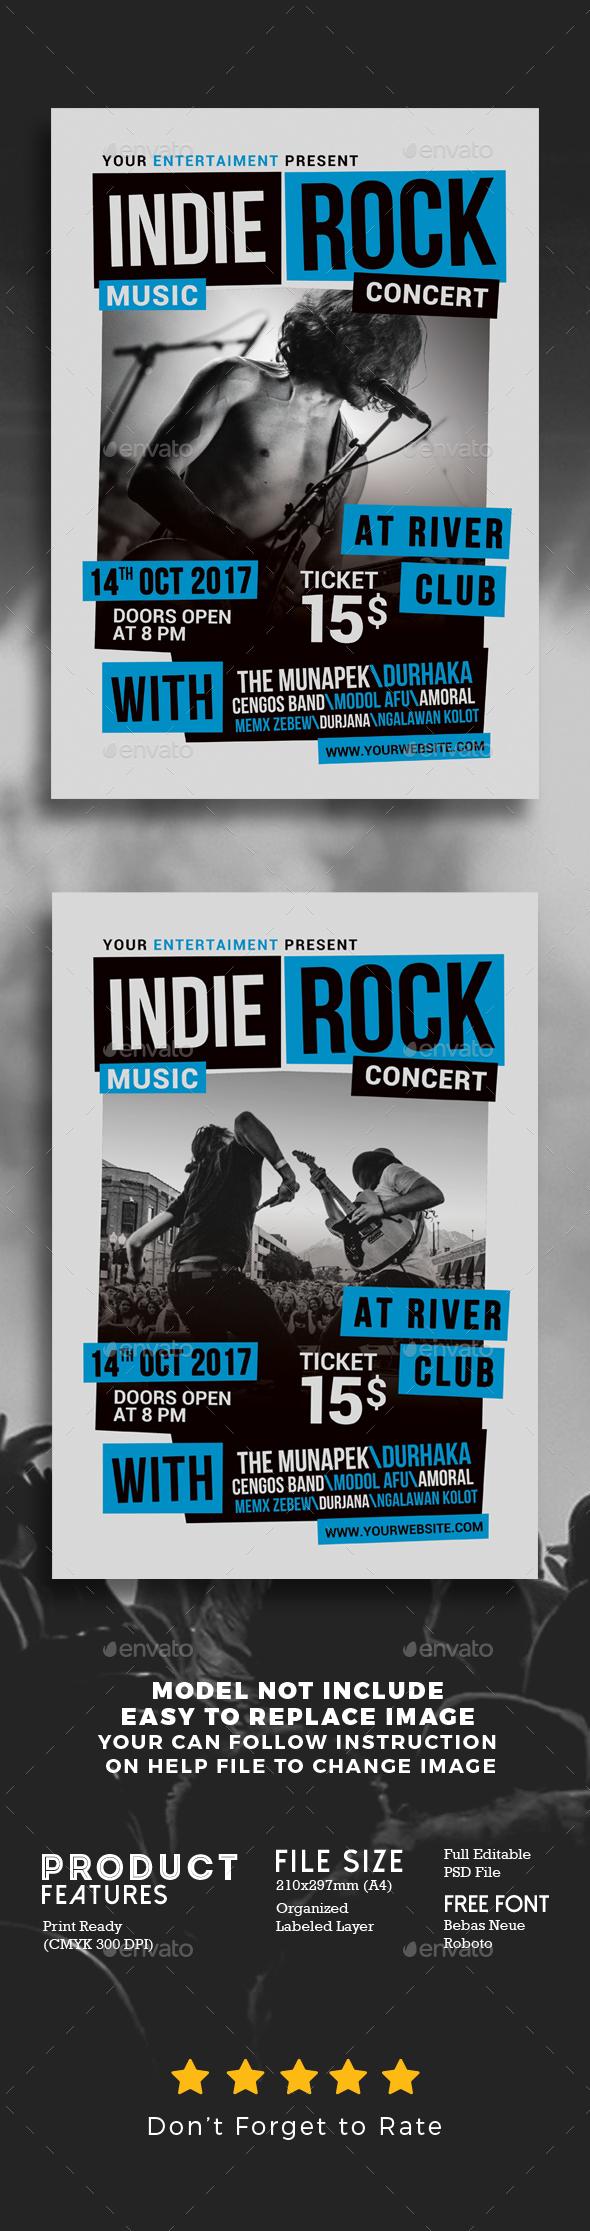 Indie Rock Music Concert Flyer - Concerts Events